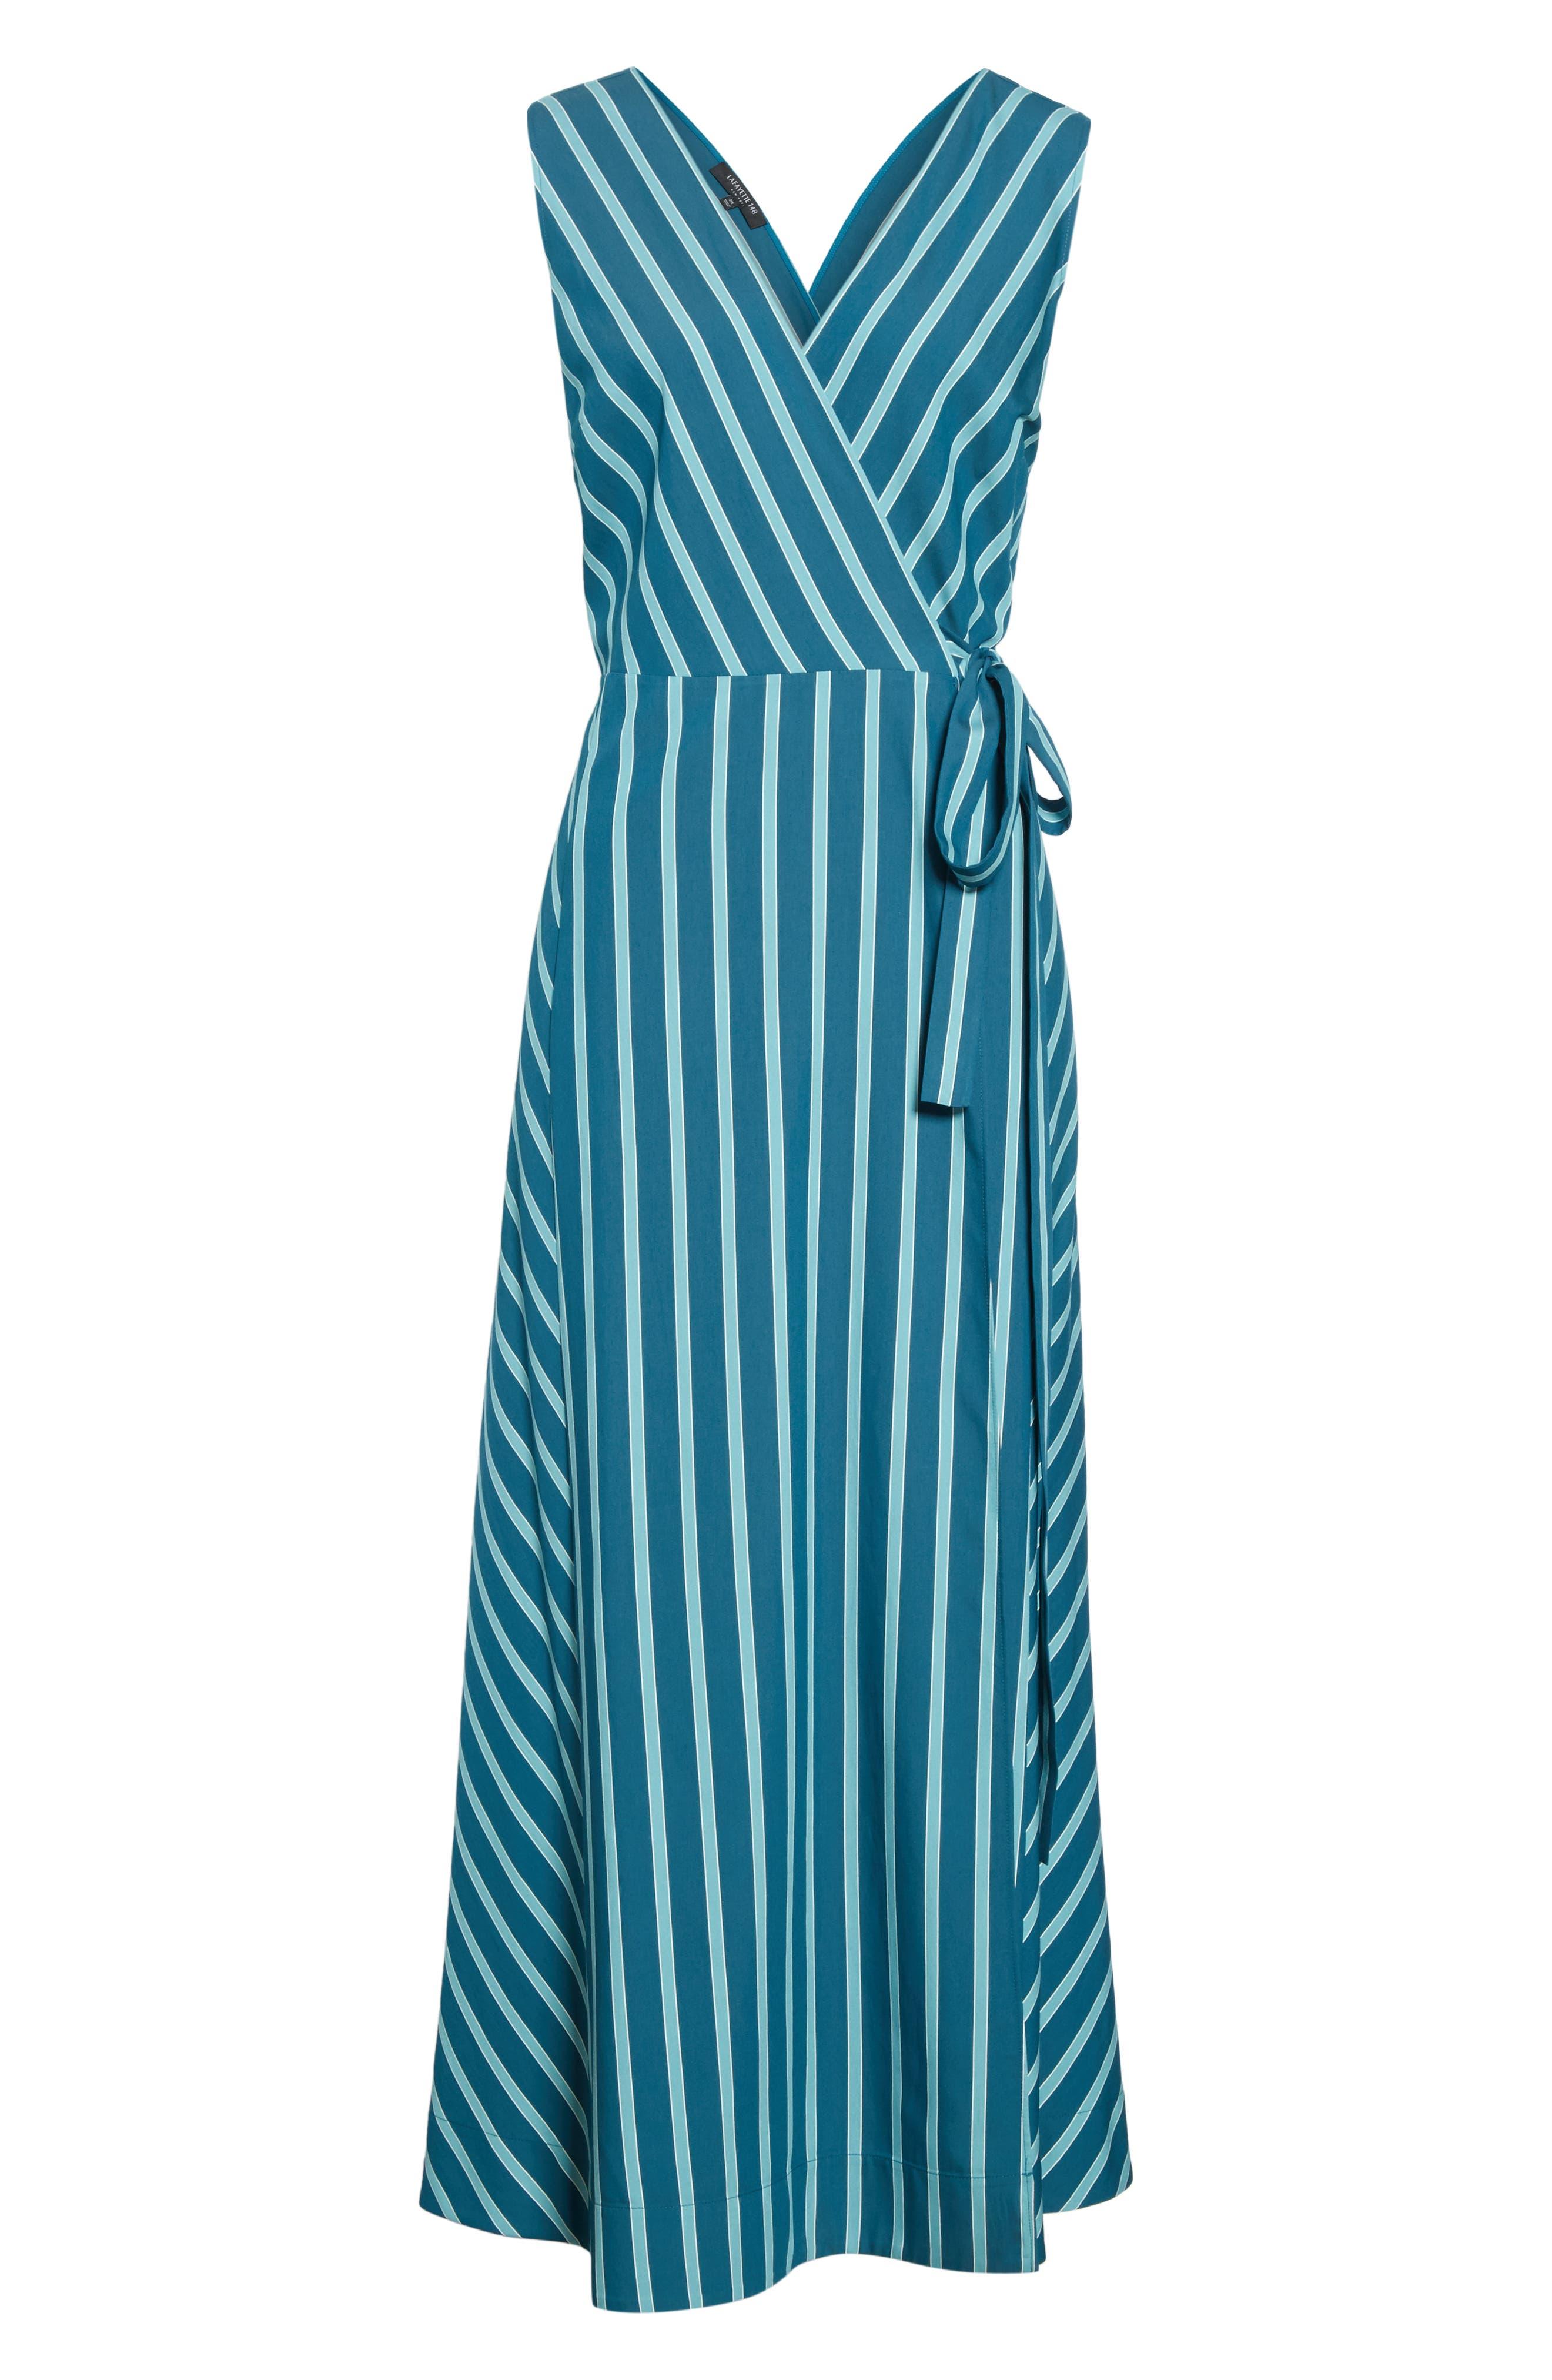 LAFAYETTE 148 NEW YORK, Siri Wrap Dress, Alternate thumbnail 7, color, PACIFIC MULTI